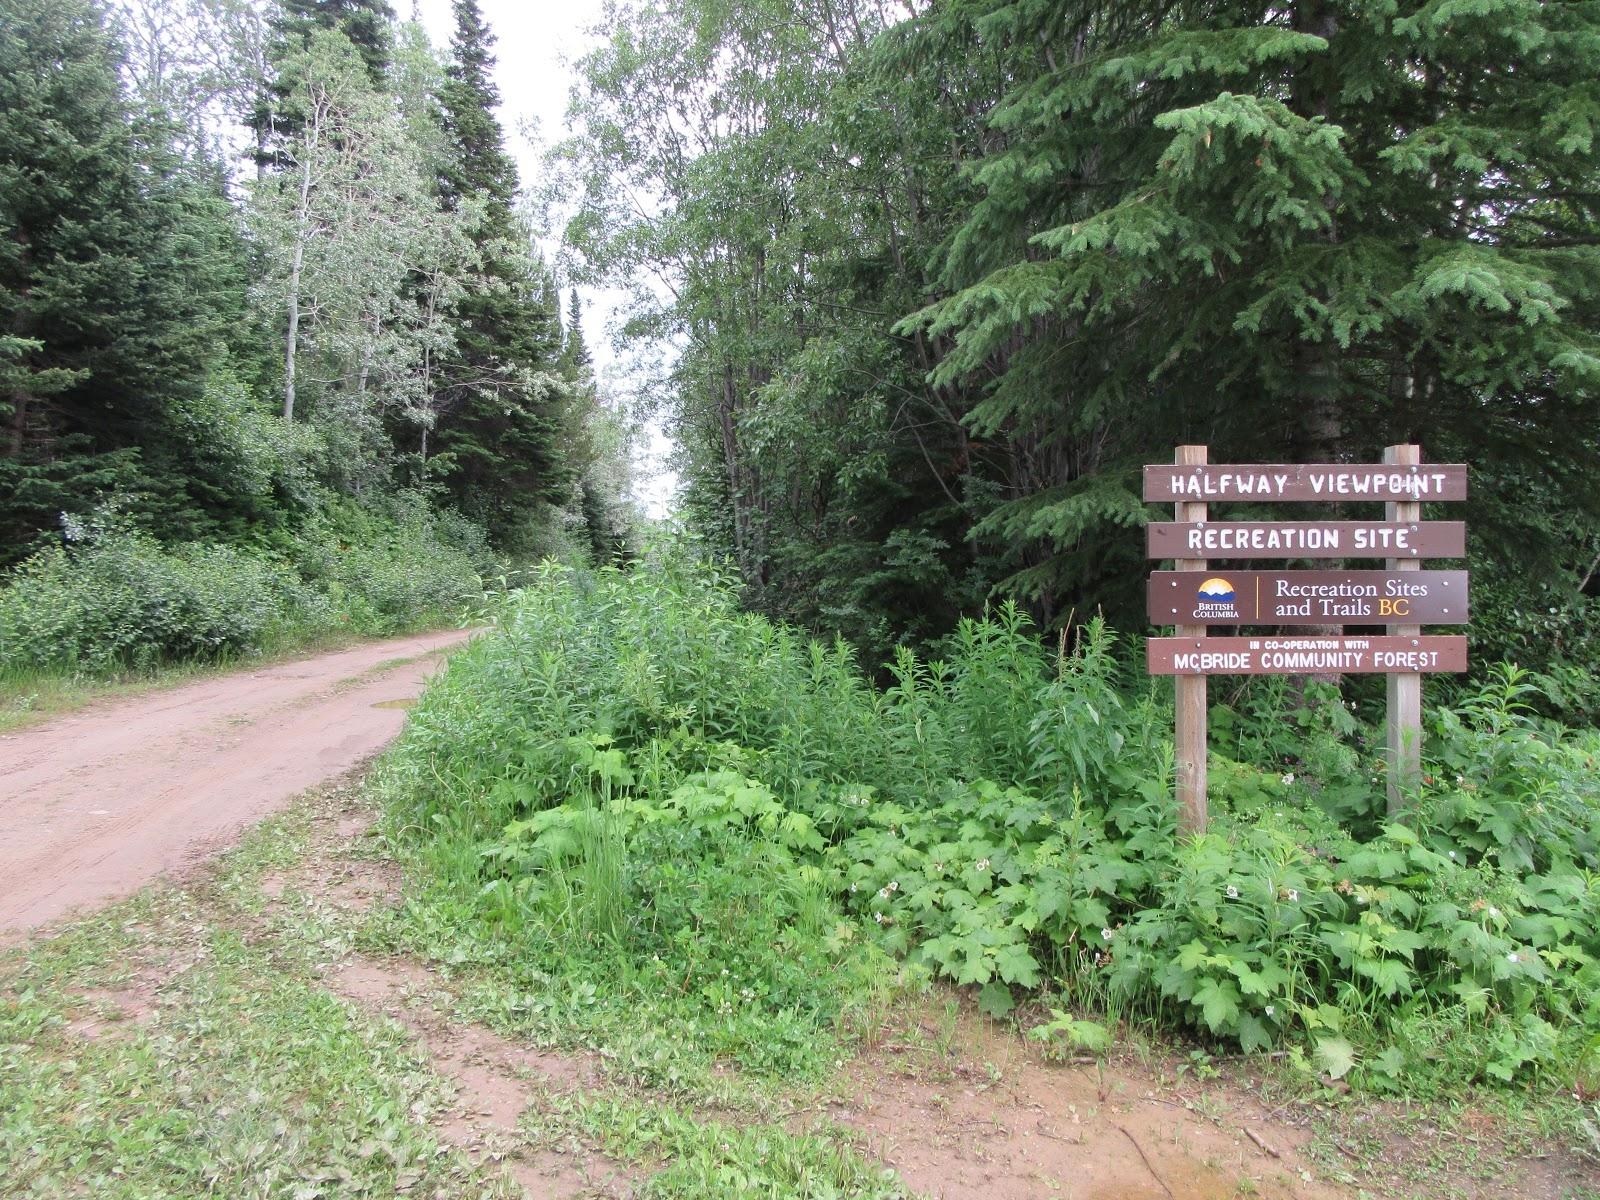 Bicycle ride McBride Peak - road and road sign